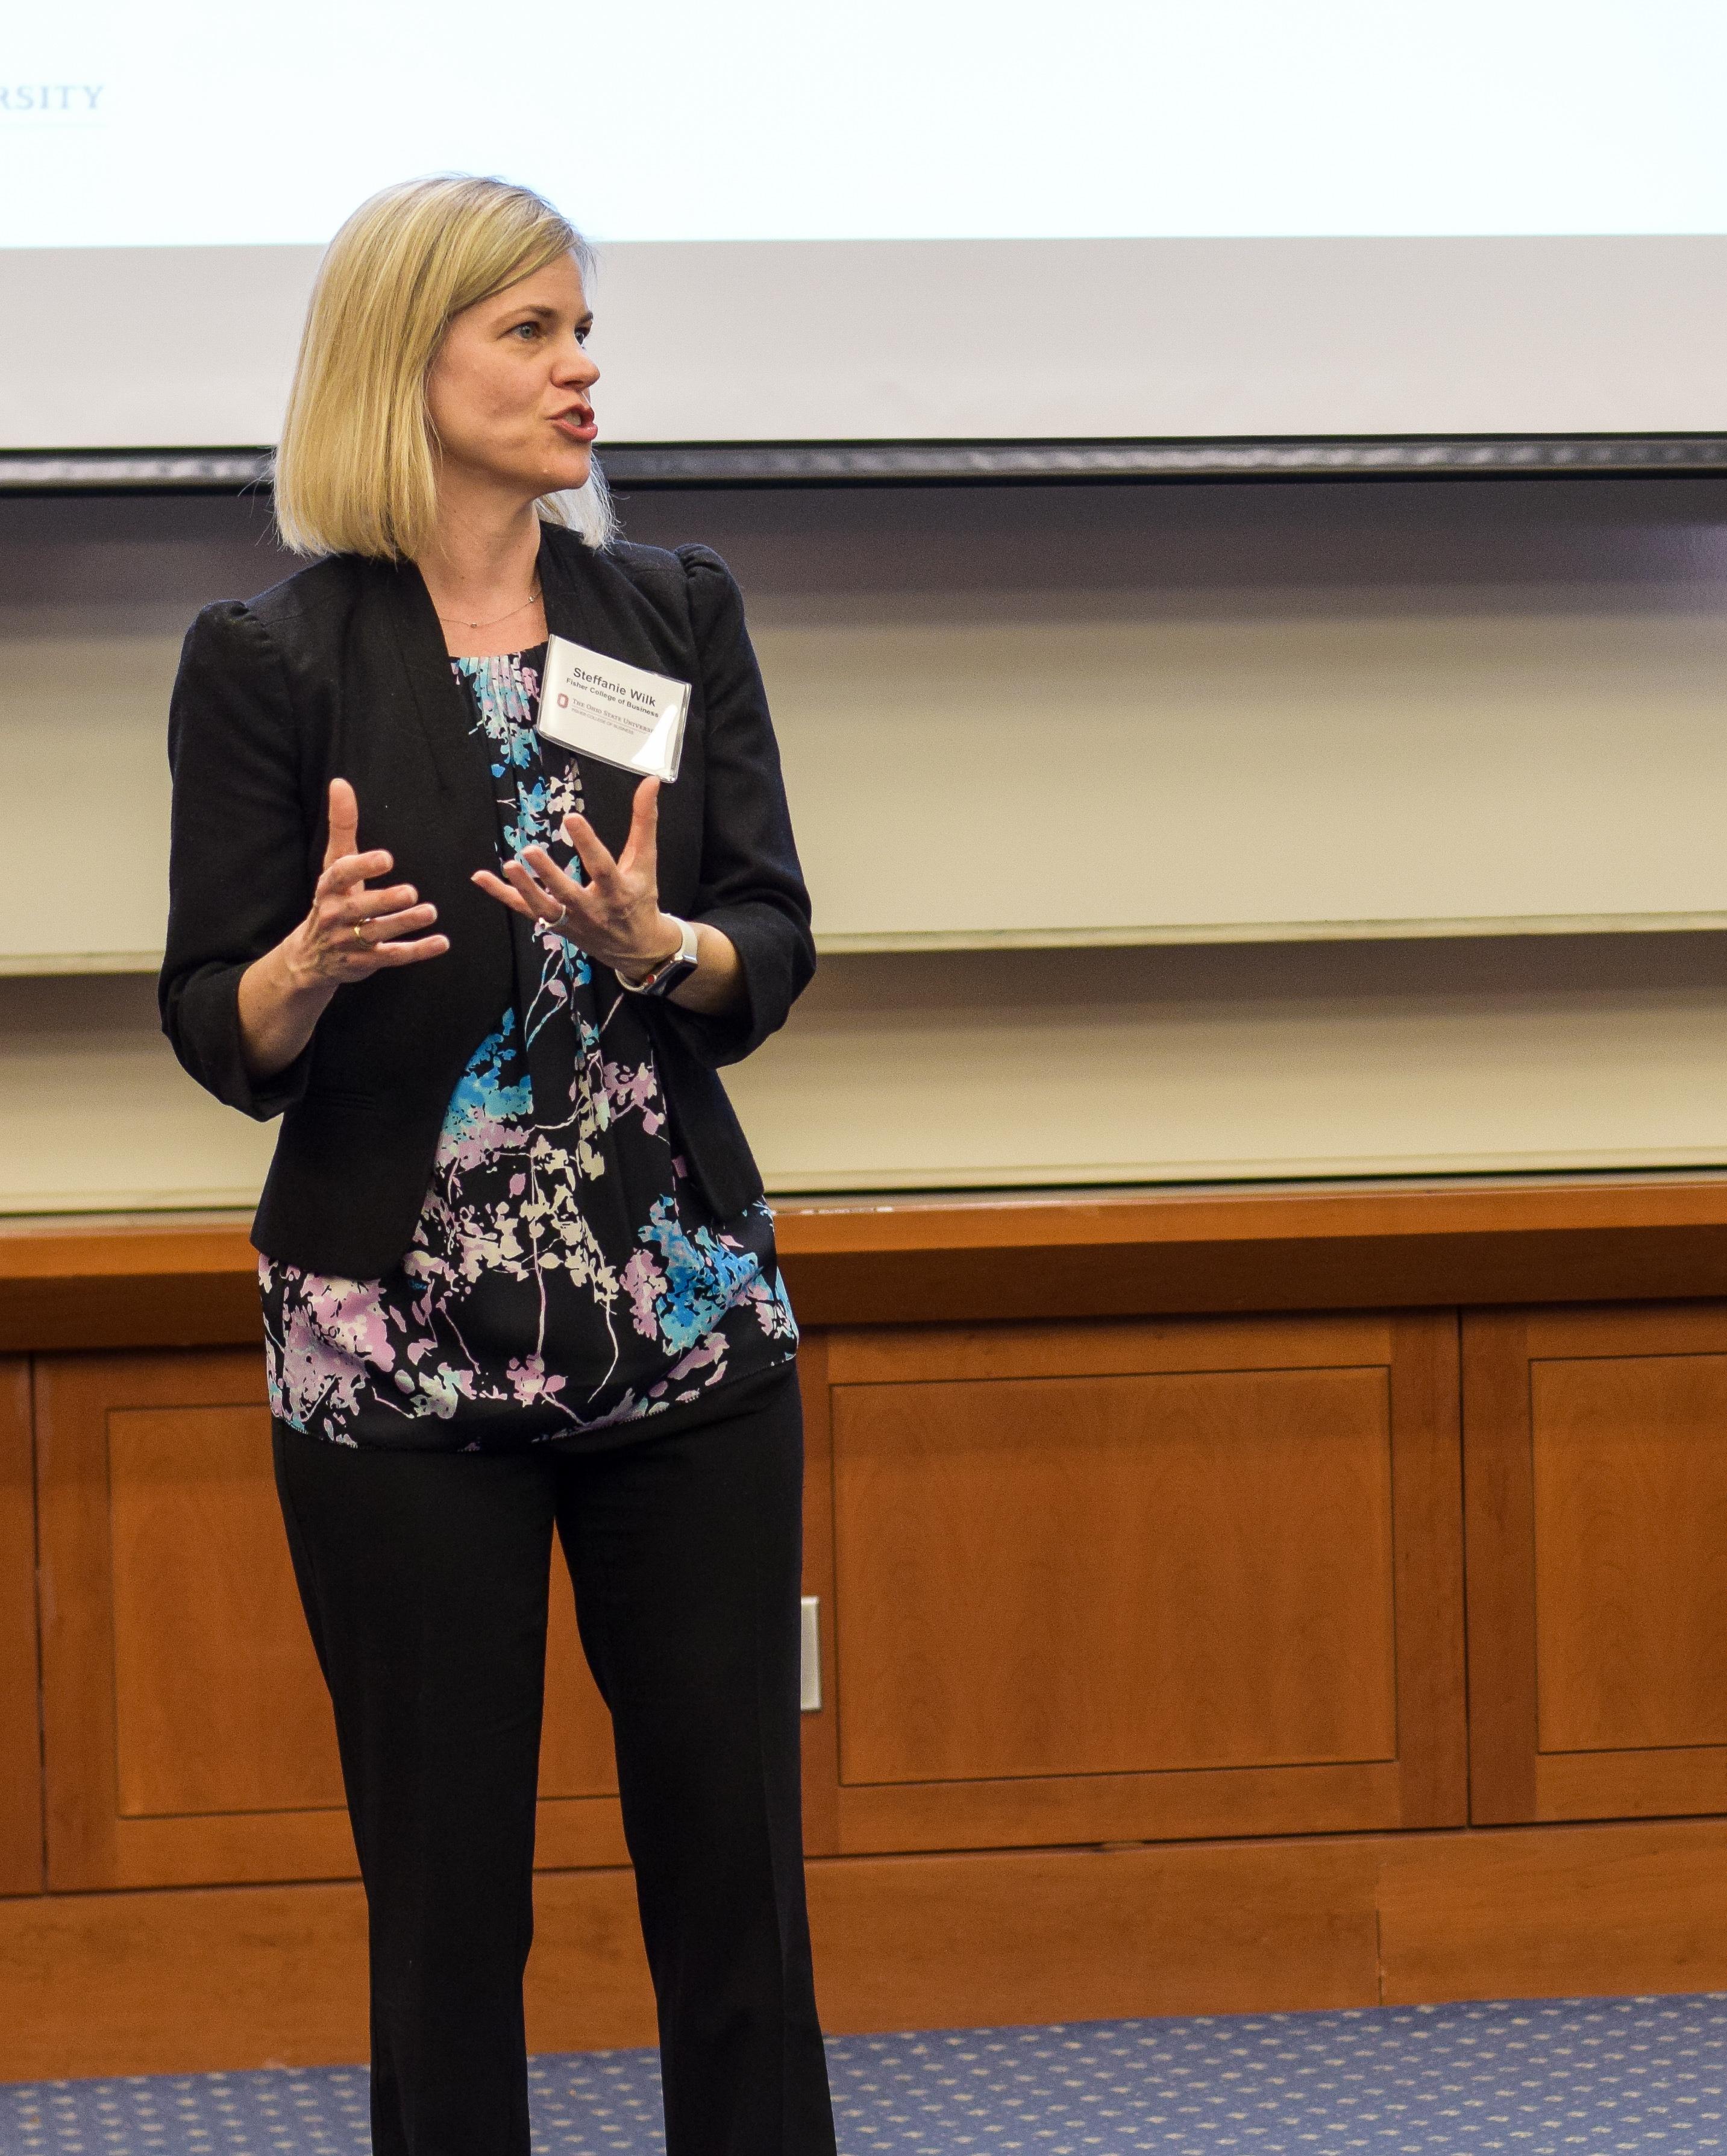 photo of presenter